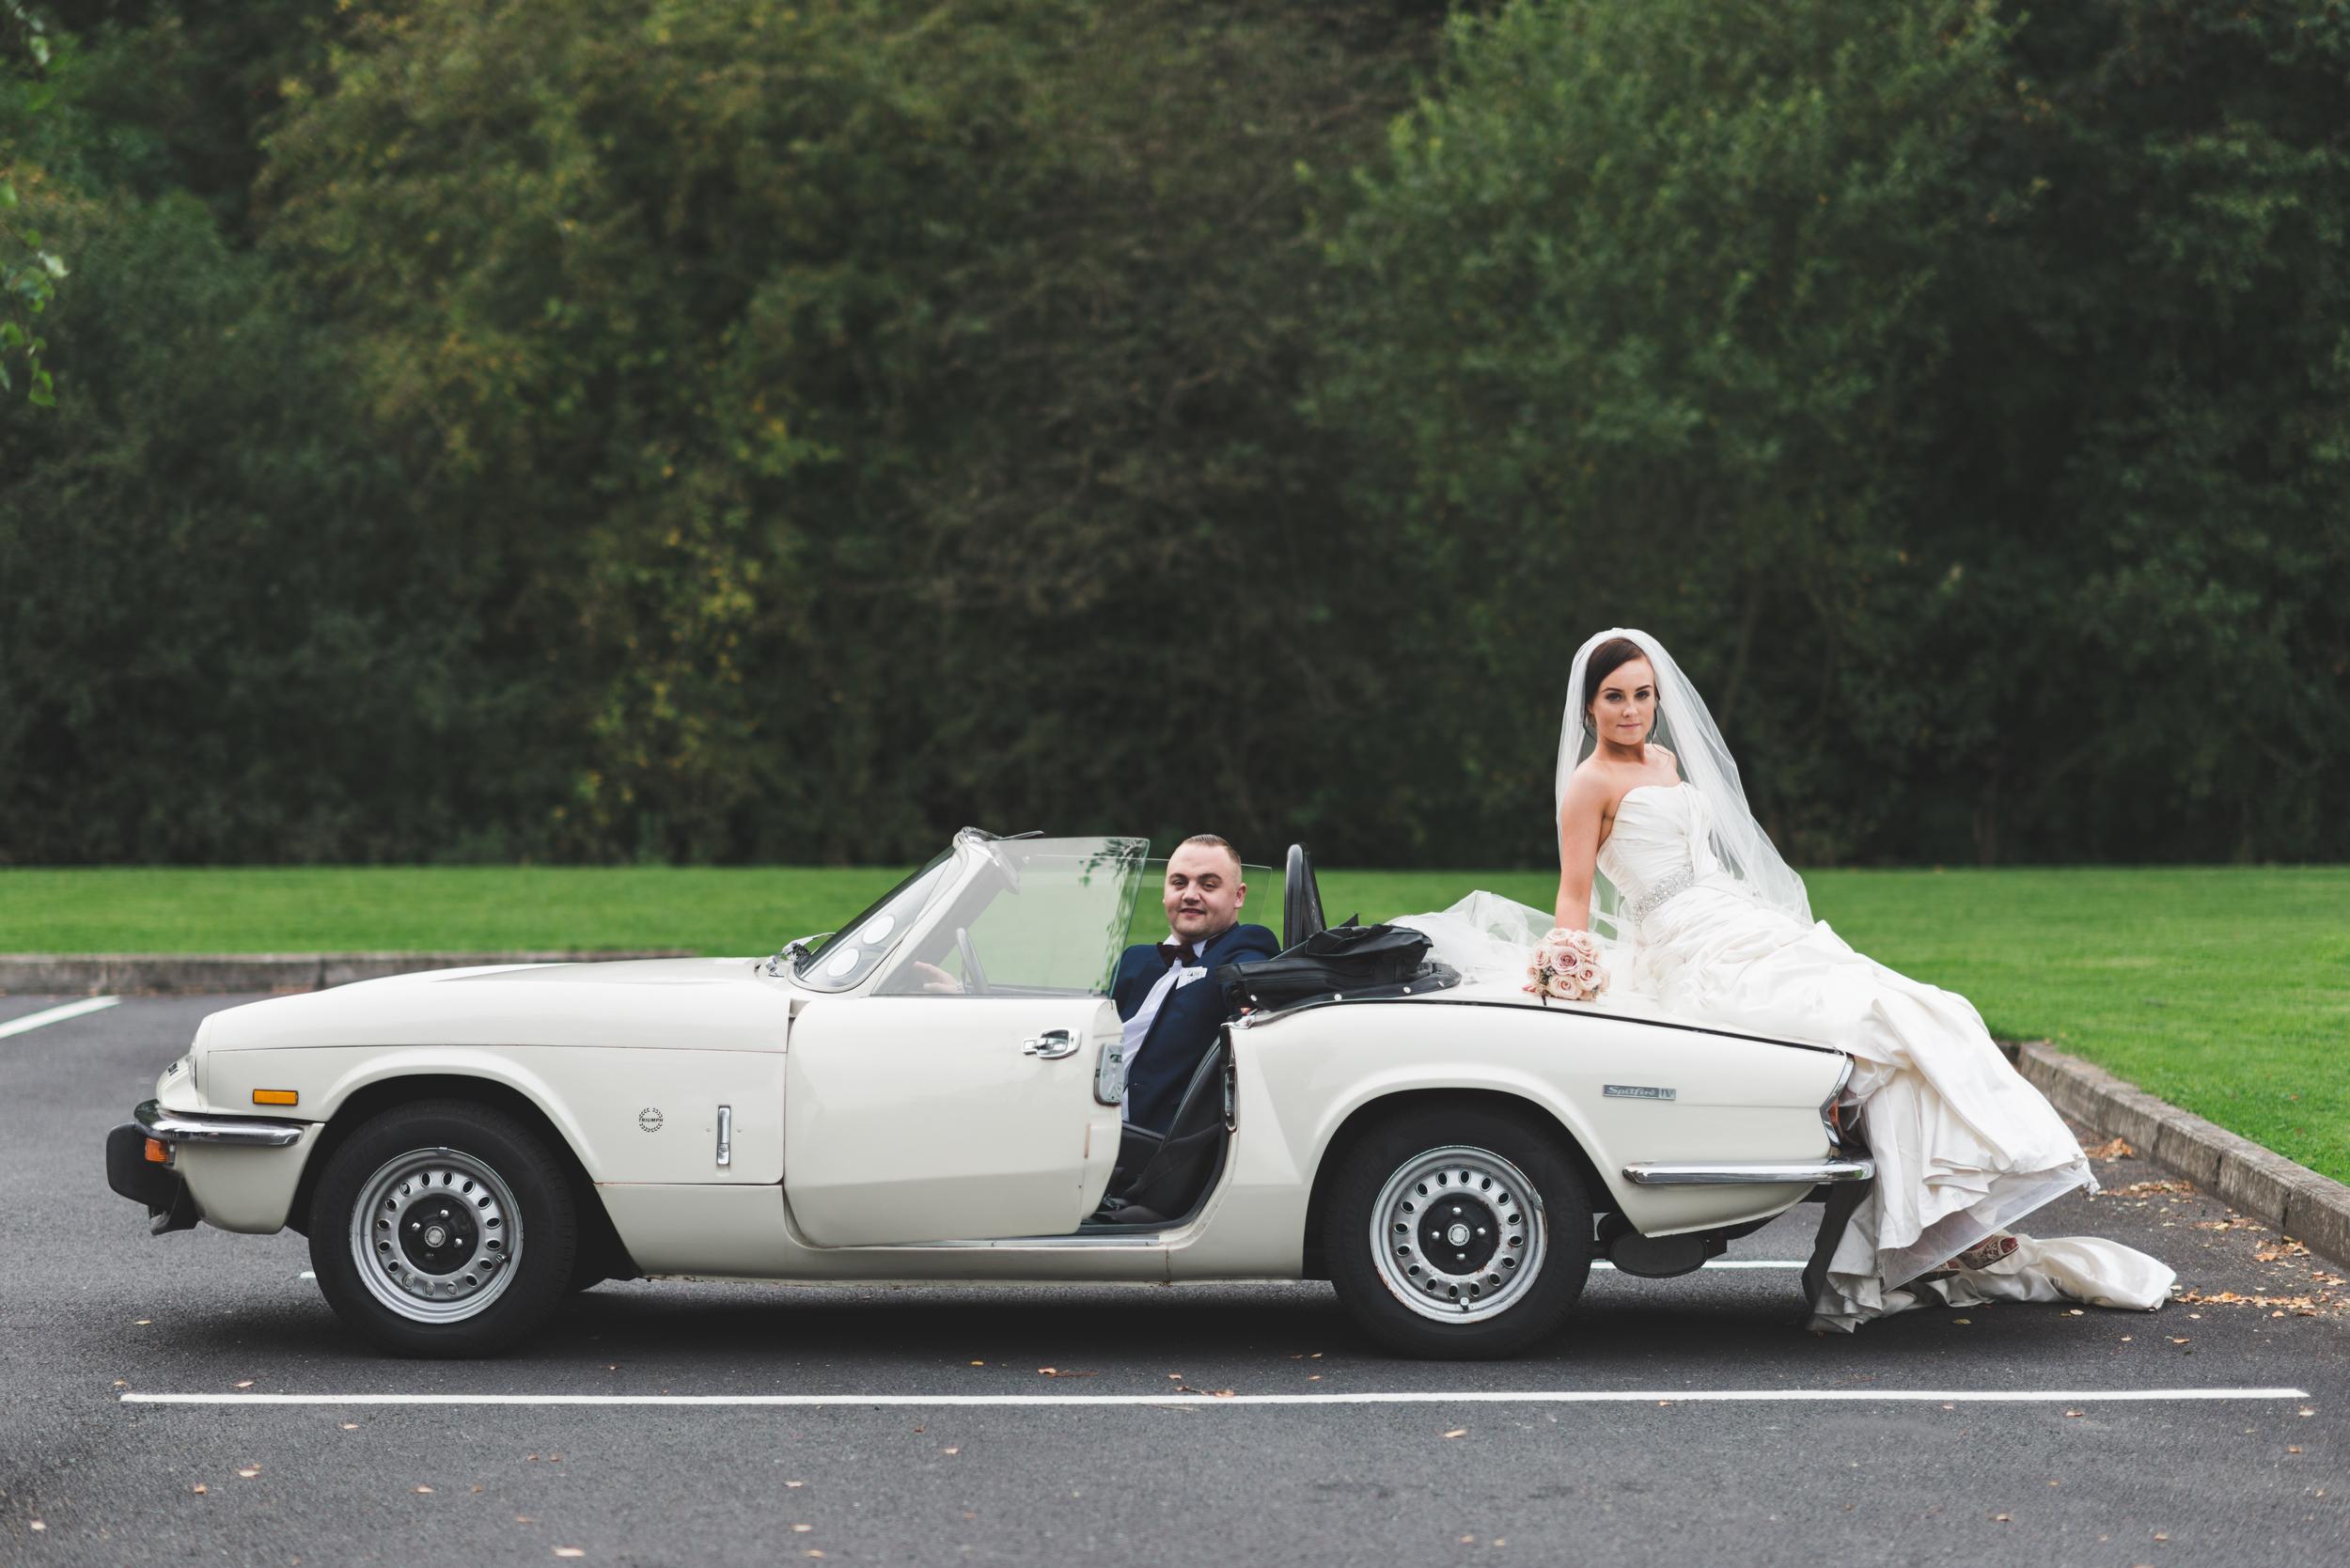 Northern_Ireland_Wedding_Photographer_Purephotoni_Dunsilly_Hotel_Wedding_Car